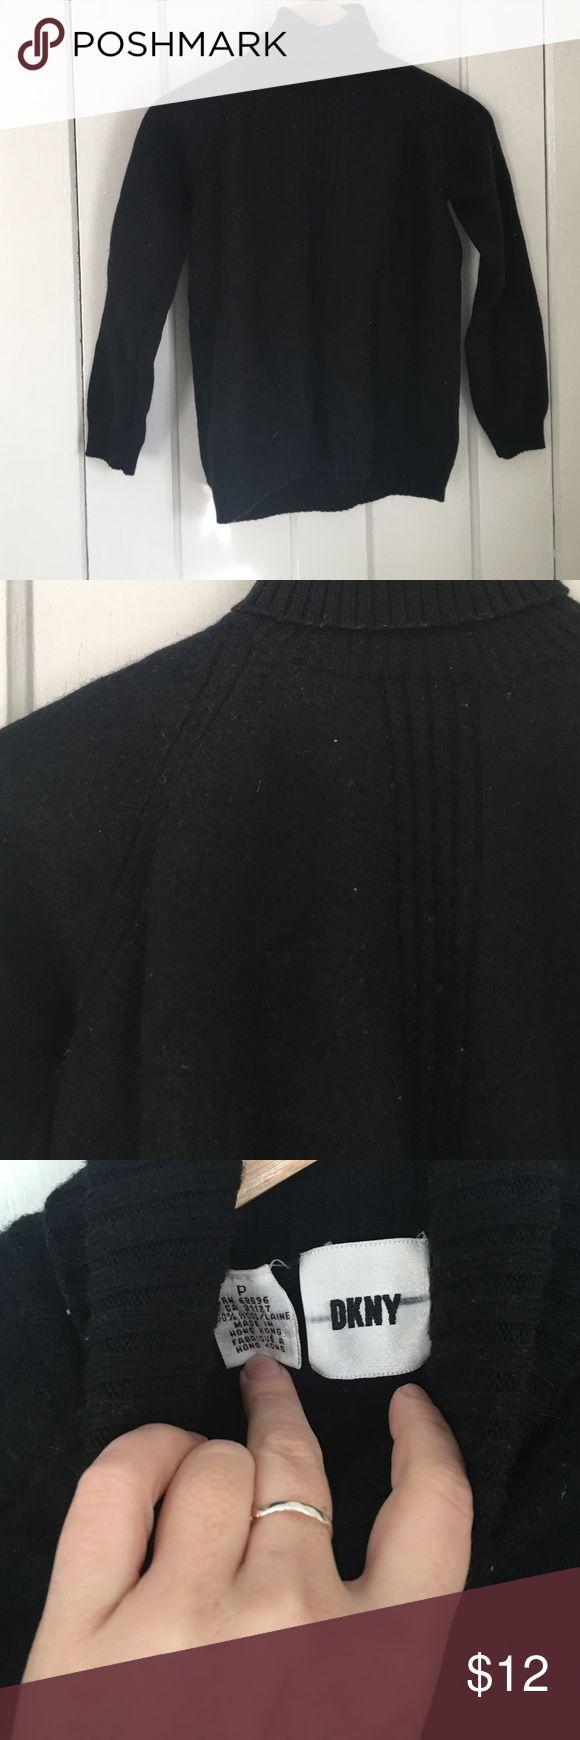 DKNY petite sweater 100%wool Mint condition. Very warm turtleneck. Is petite I say xs DKNY Sweaters Cowl & Turtlenecks